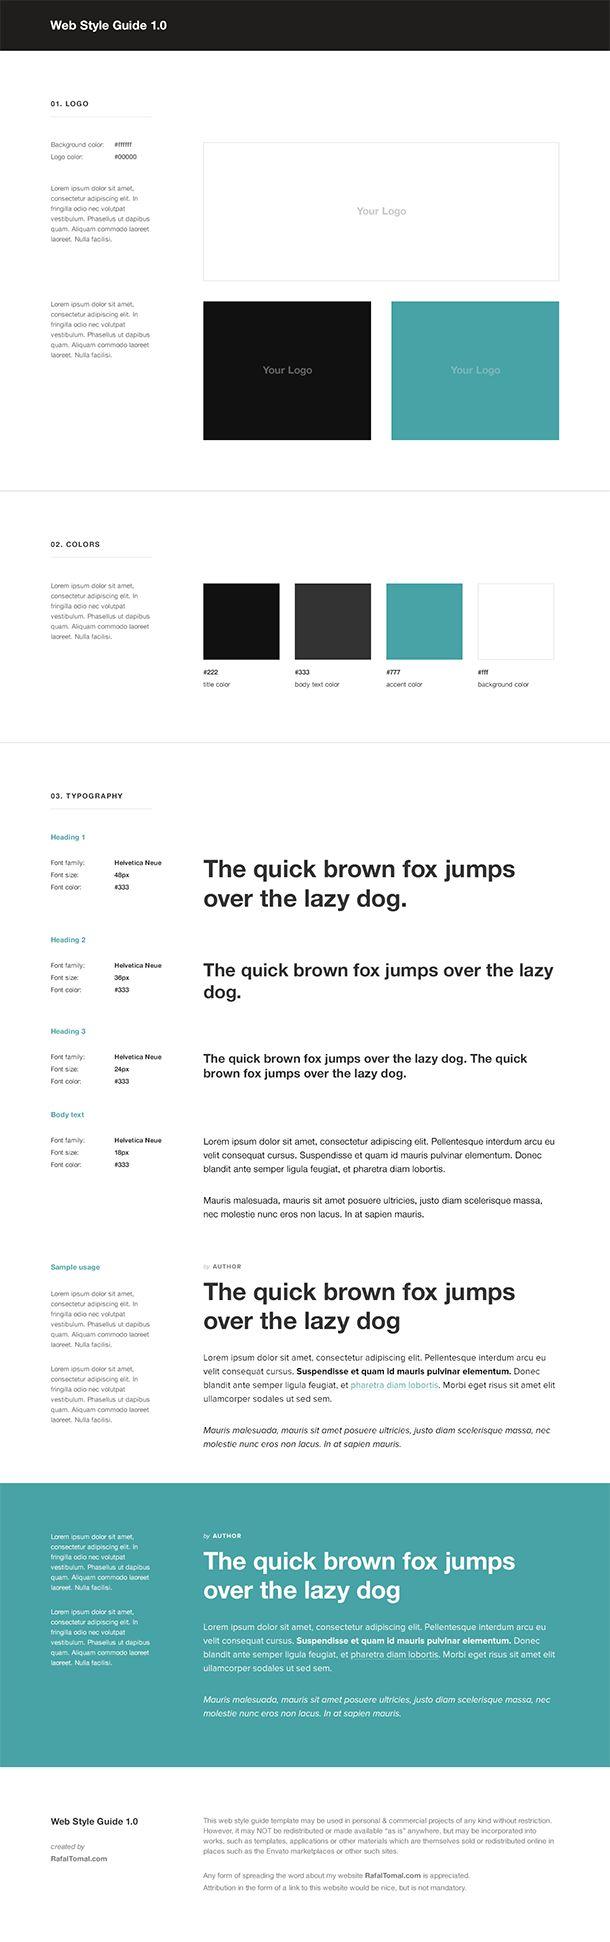 Web Style Guide Template - RafalTomal.com